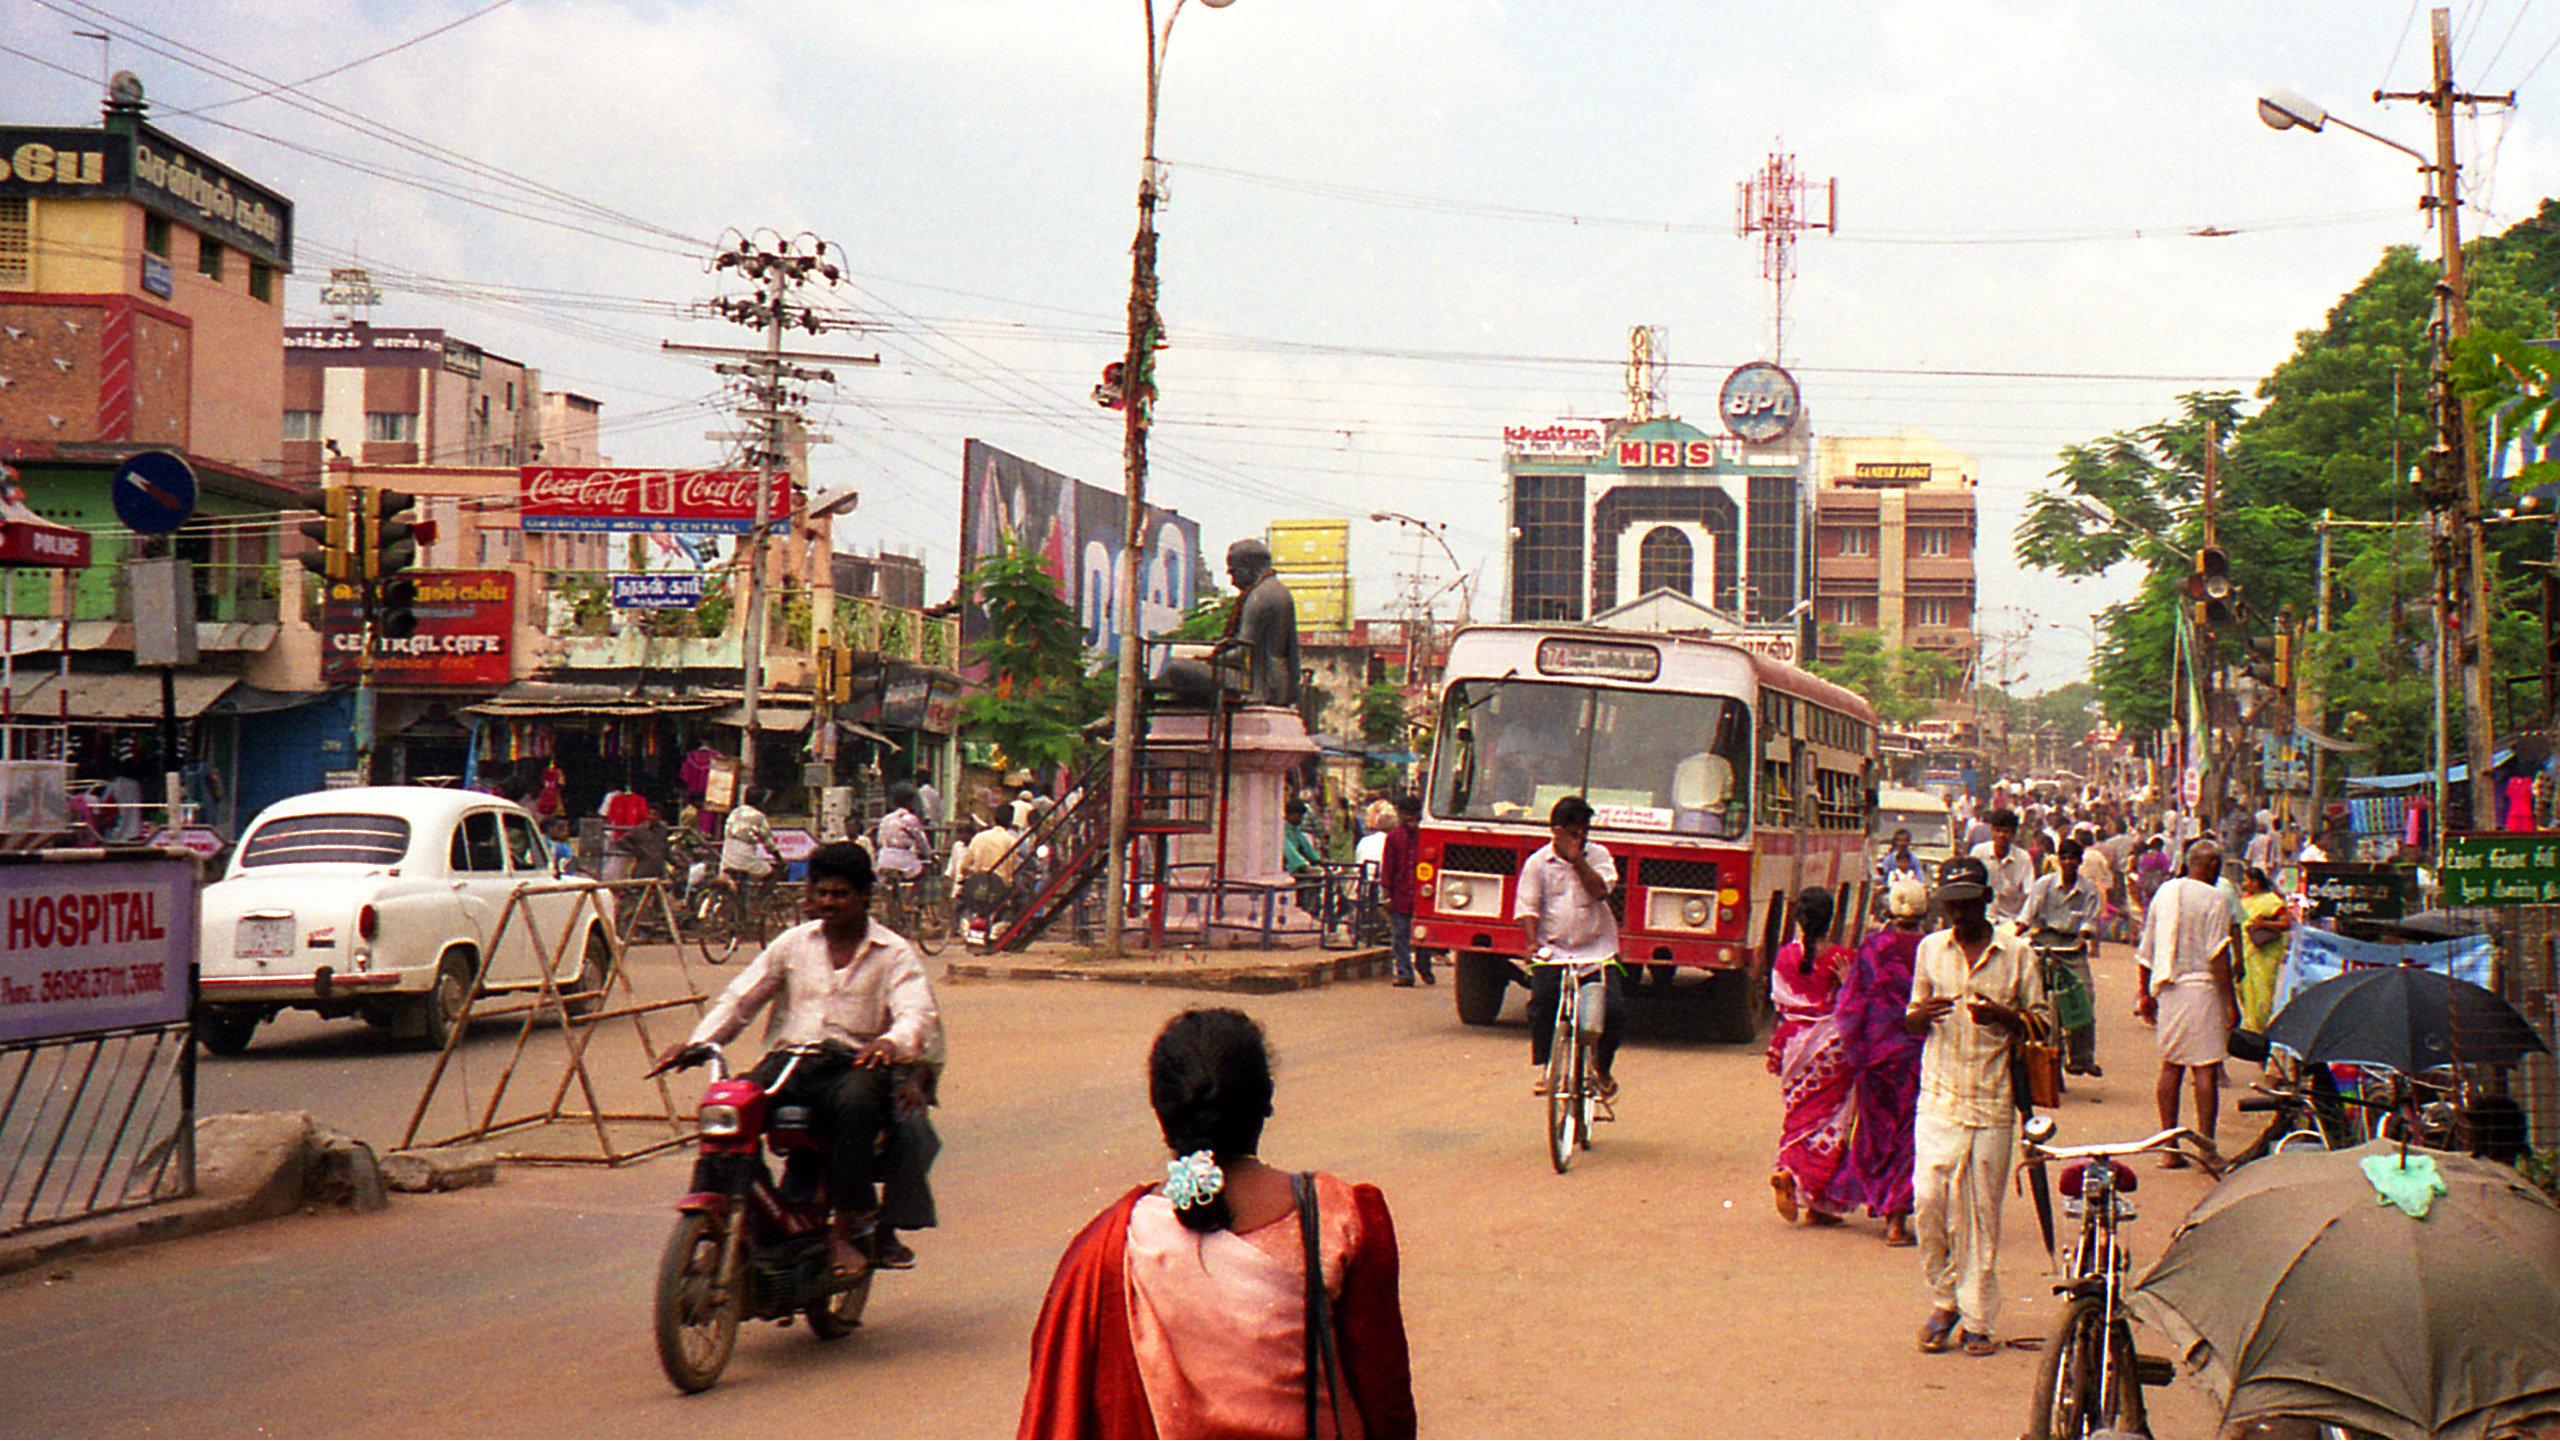 Street scene in southern india